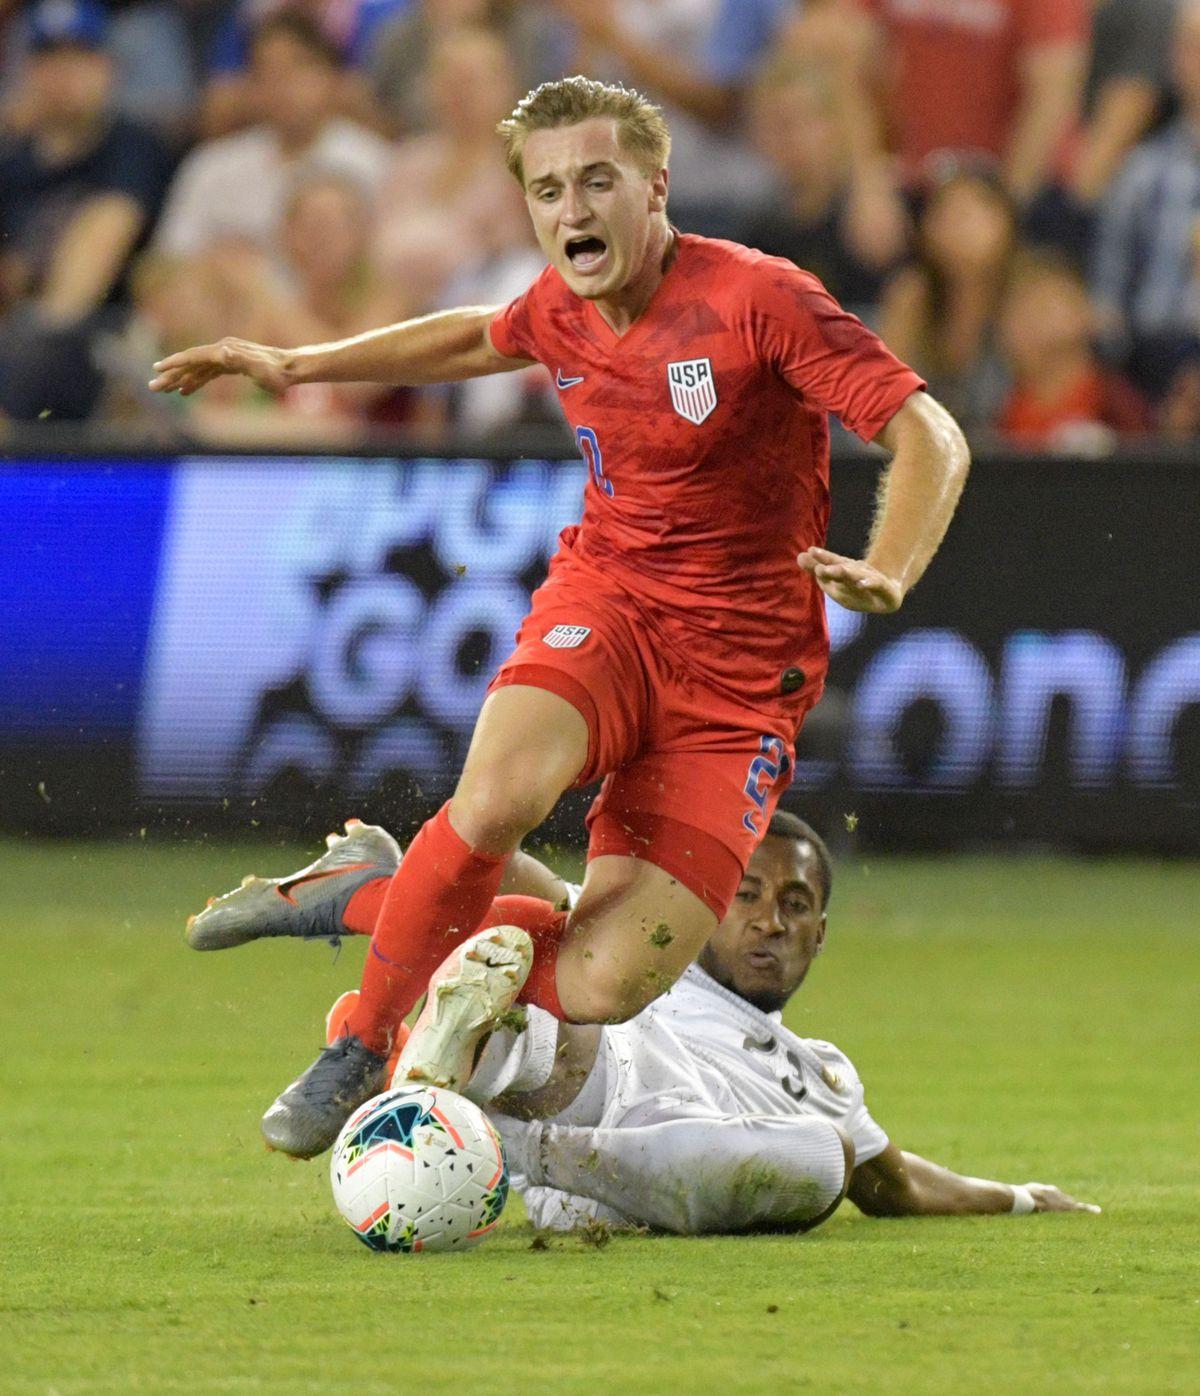 FBL-CONCACAF-GOLDCUP-PAN-USA